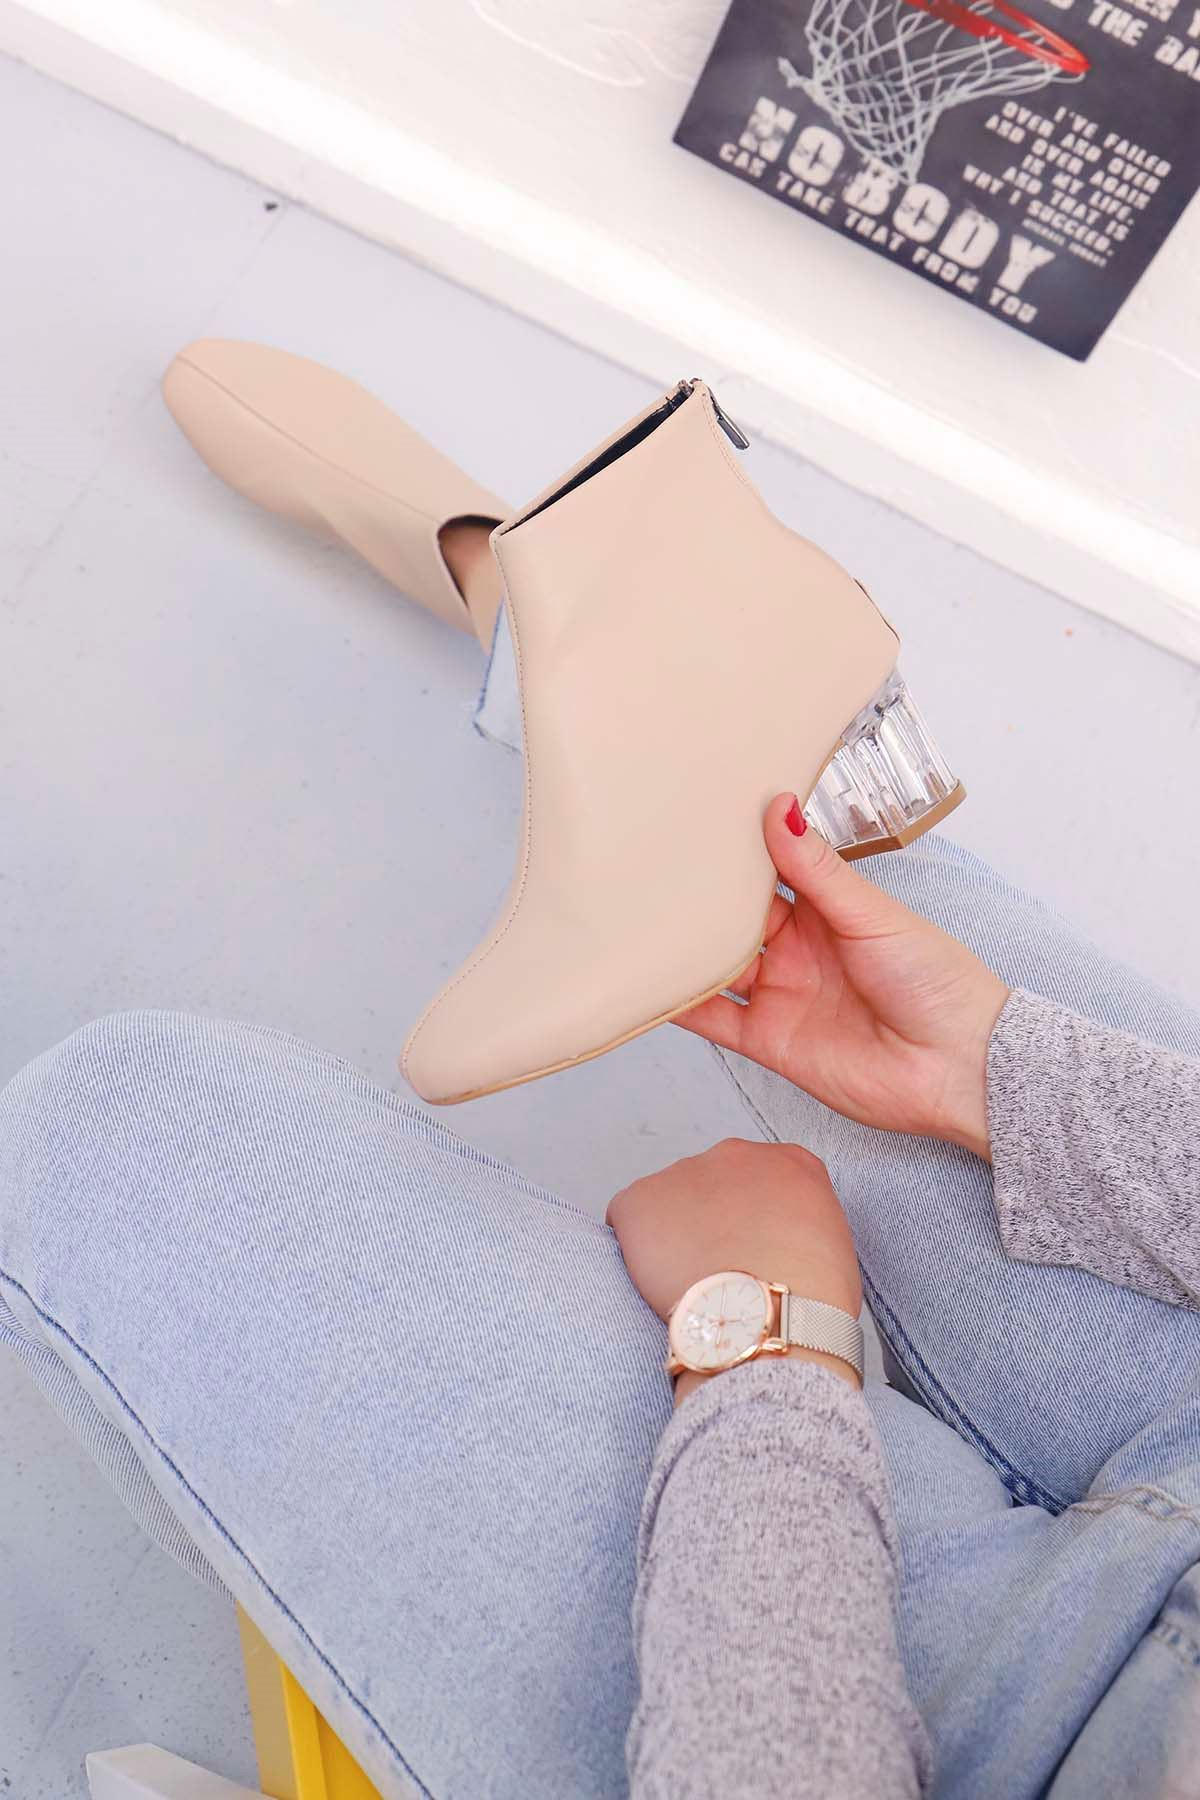 mami-Şeffaf Topuk Küt Burun Topuklu Bot Nut Deri